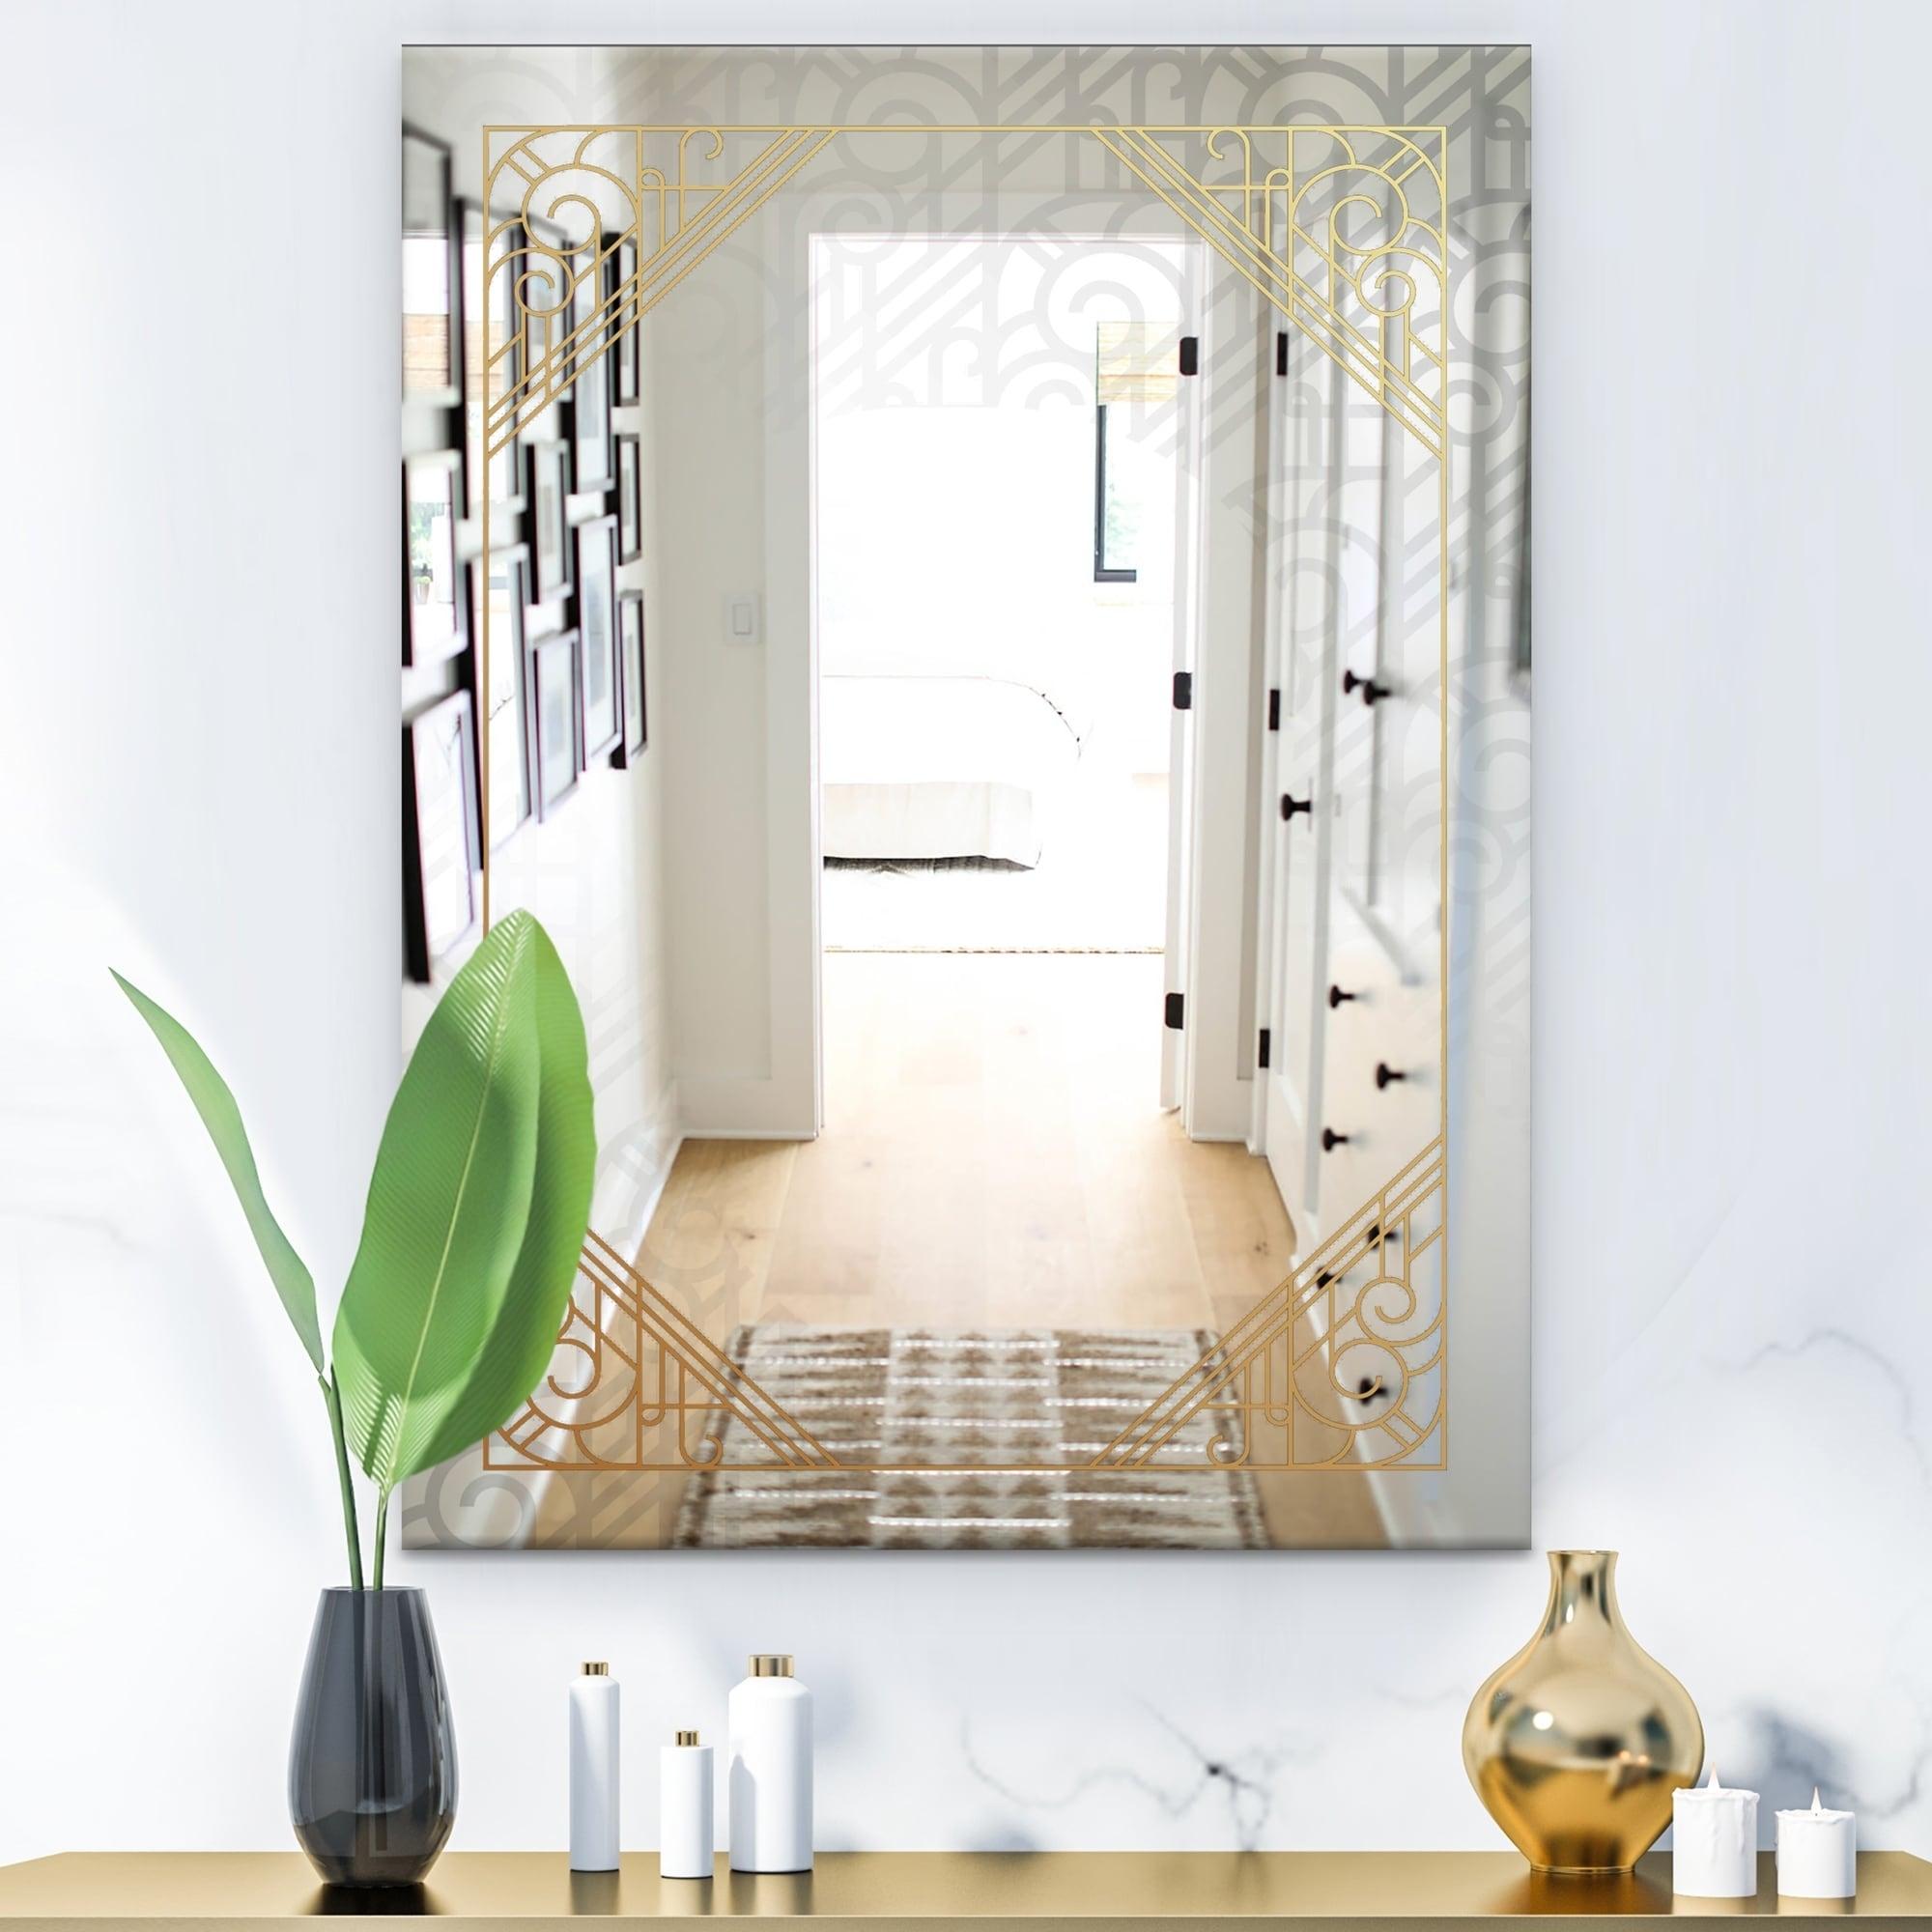 Shop Black Friday Deals On Designart Luxury Modern Mirror Contemporary Bathroom Mirror On Sale Overstock 28004516